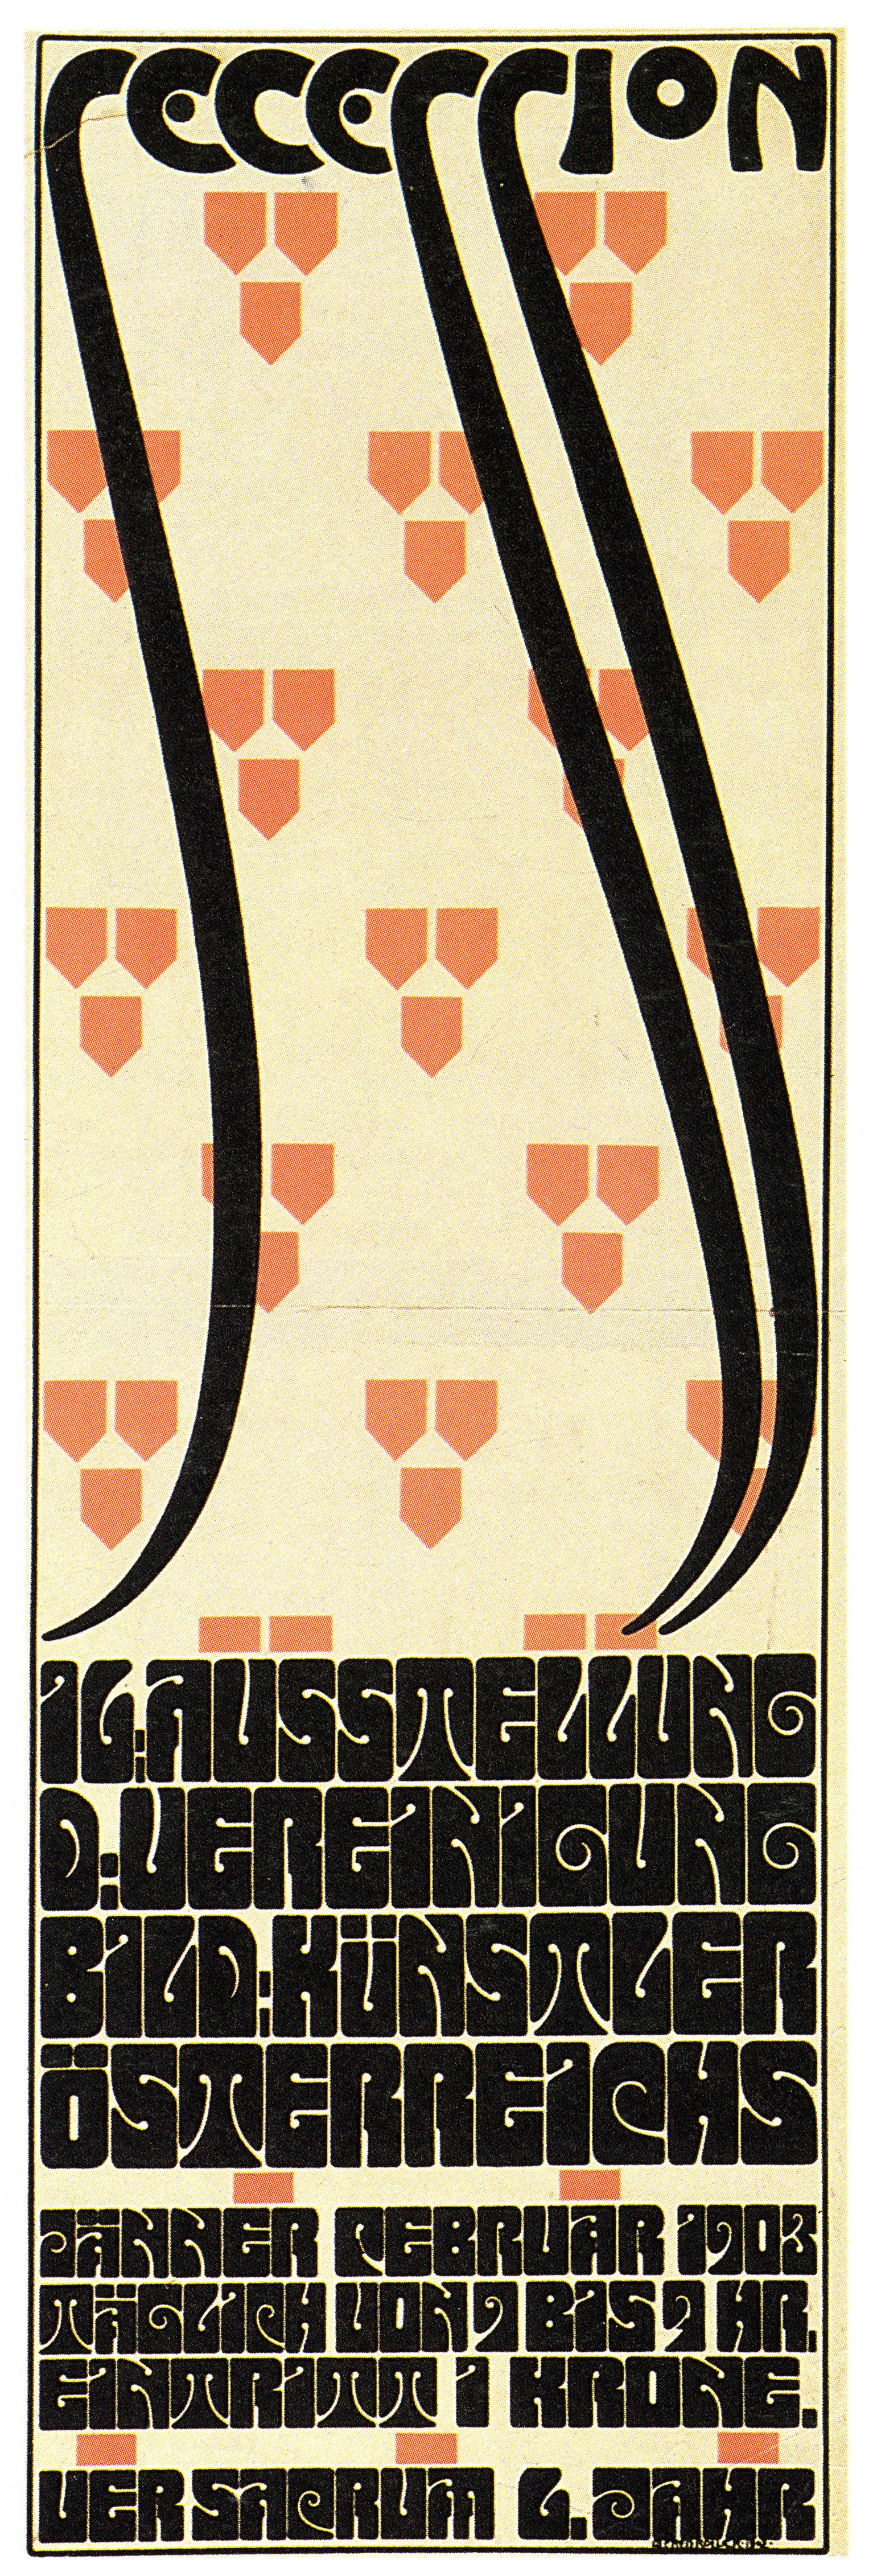 vienna secession  sixteenth exhibition  poster